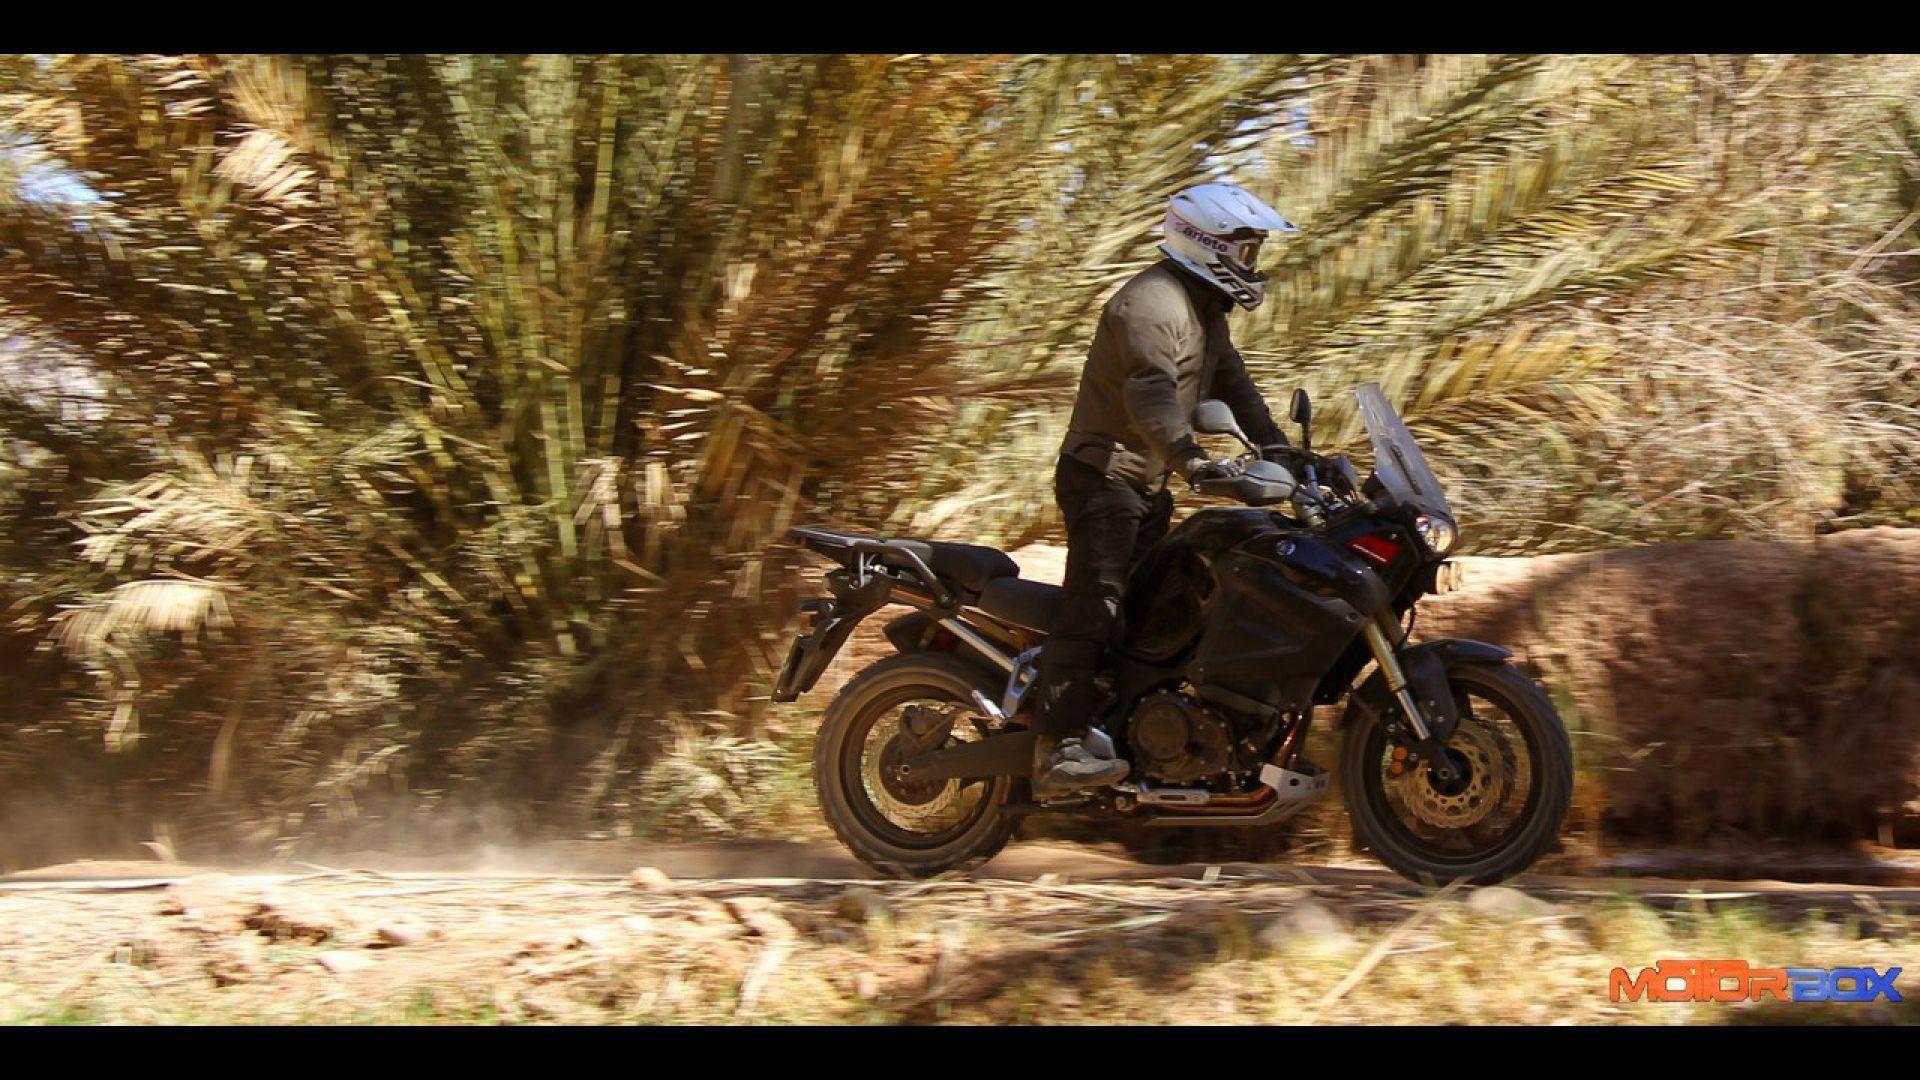 Immagine 145: In Marocco con la Yamaha Super Ténéré